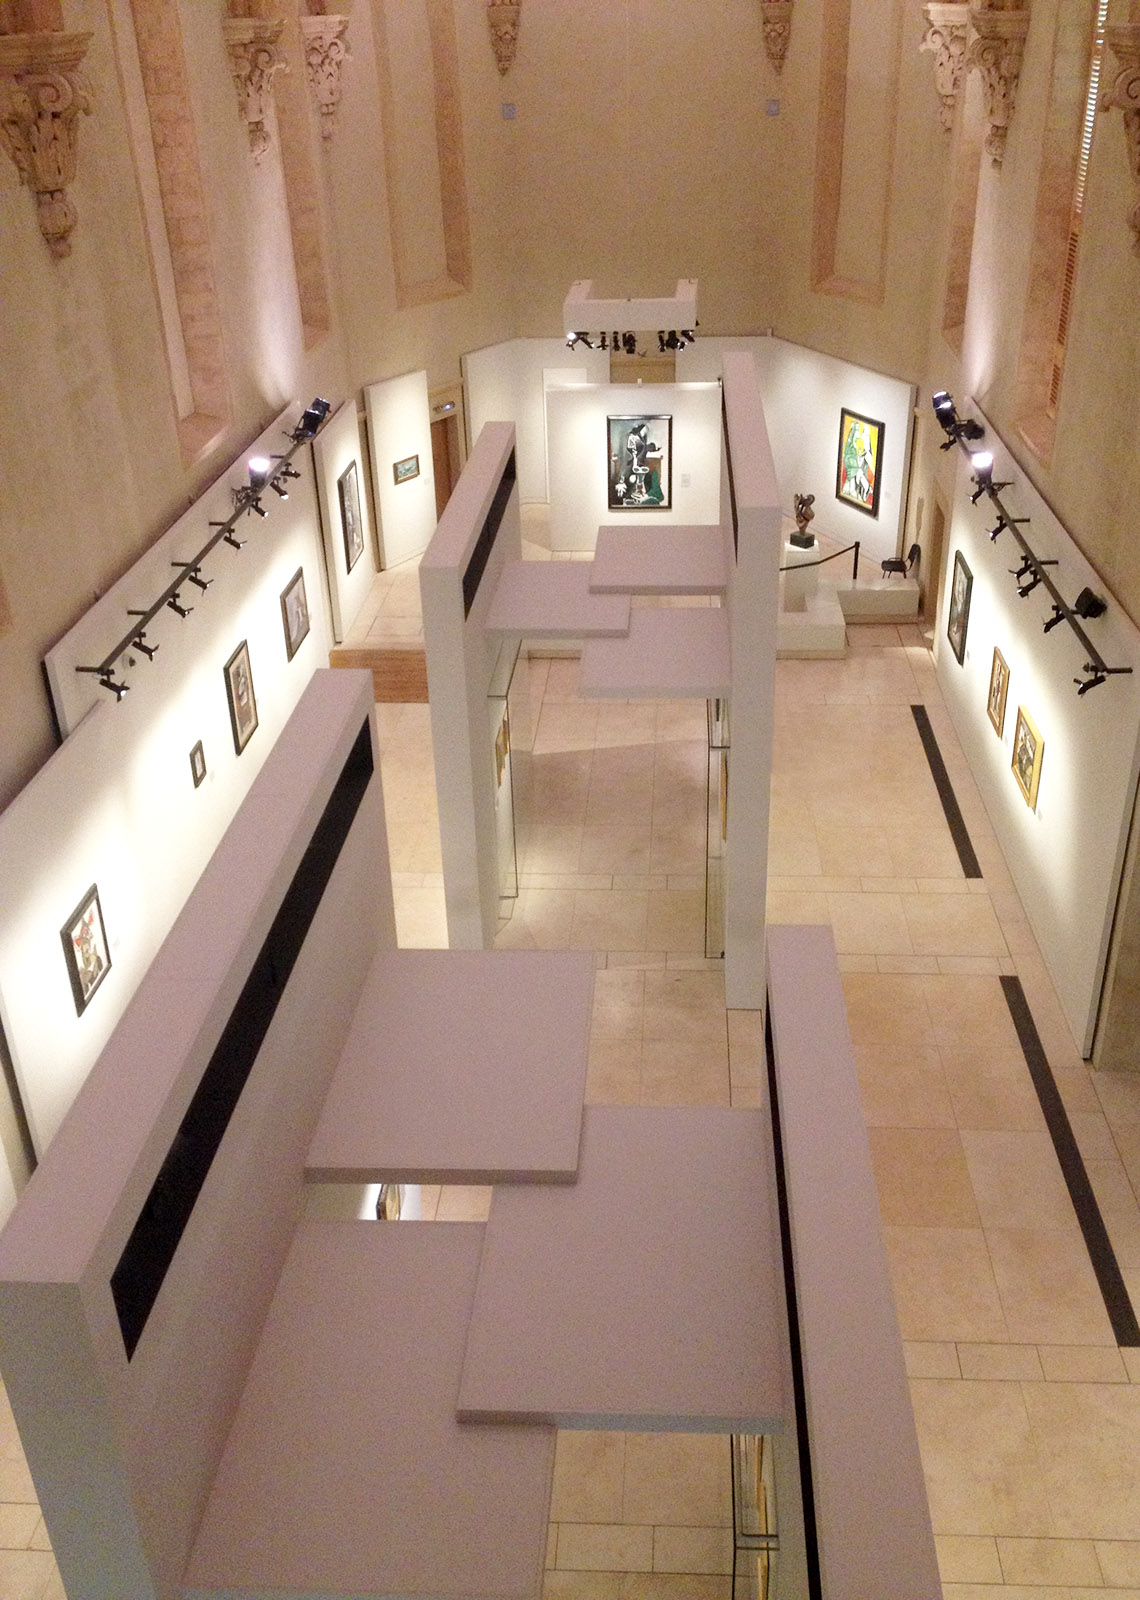 Aix-en-Provence: Musée Granet. Foto: Hilke Maunder